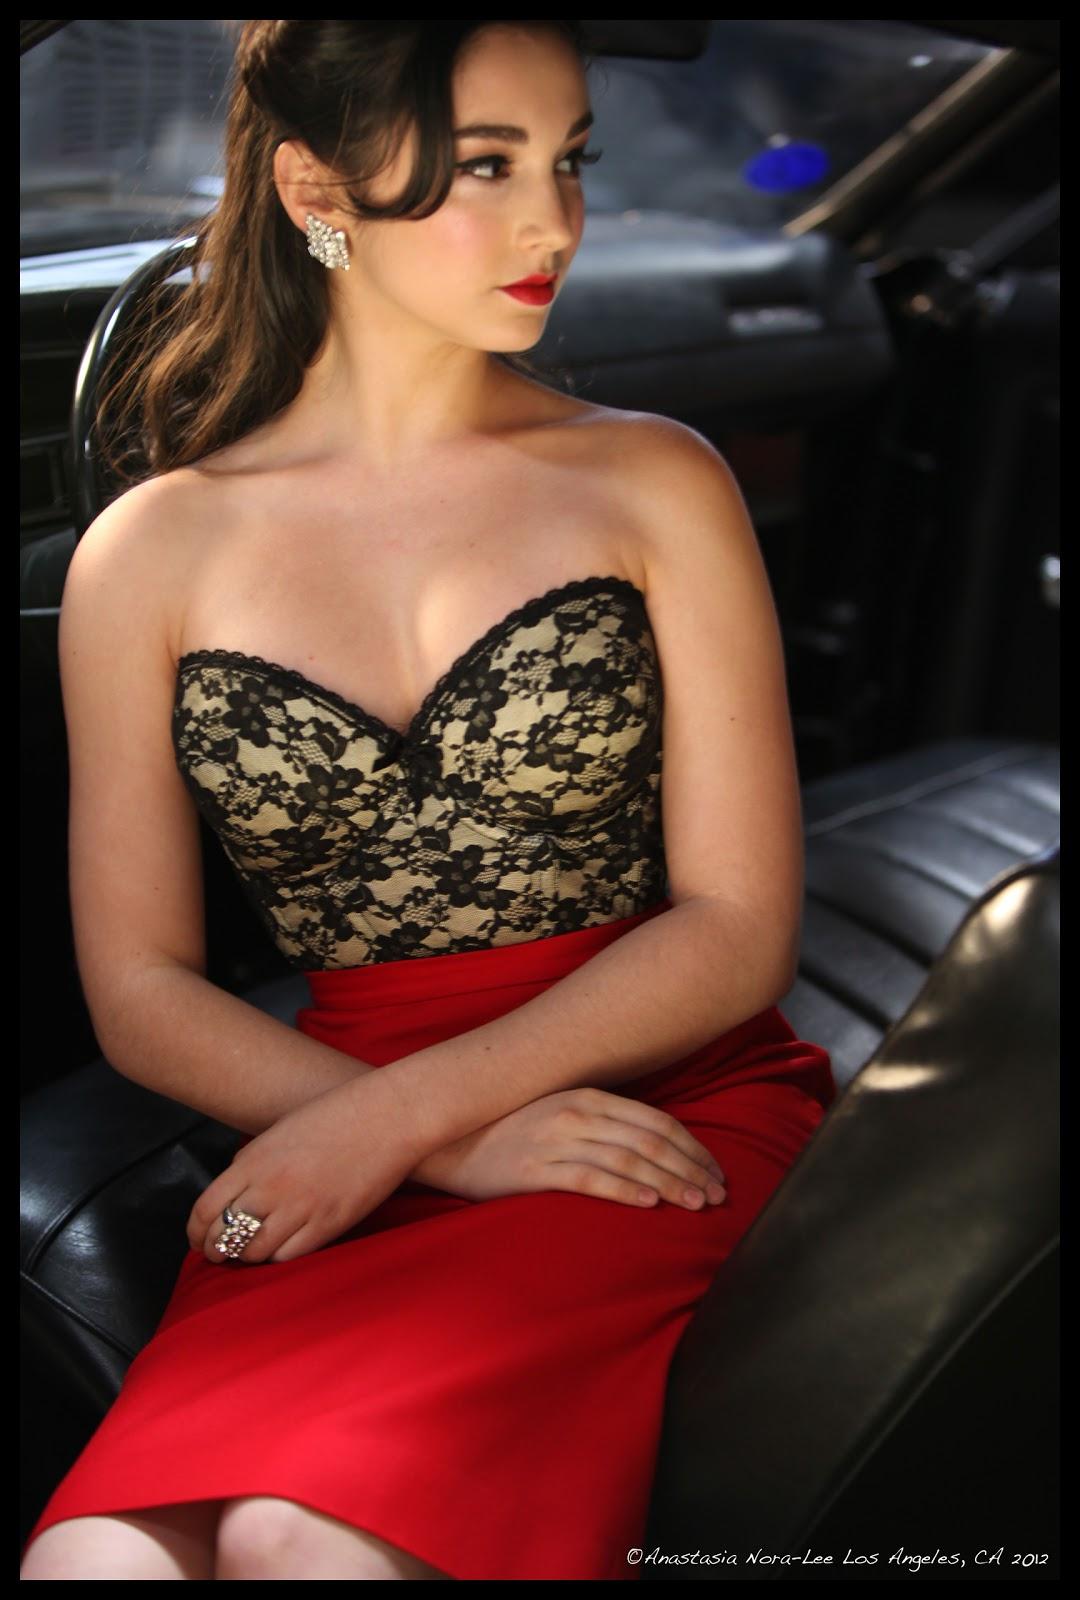 Molly Ephraim Looking so beauty photos ~ world actress